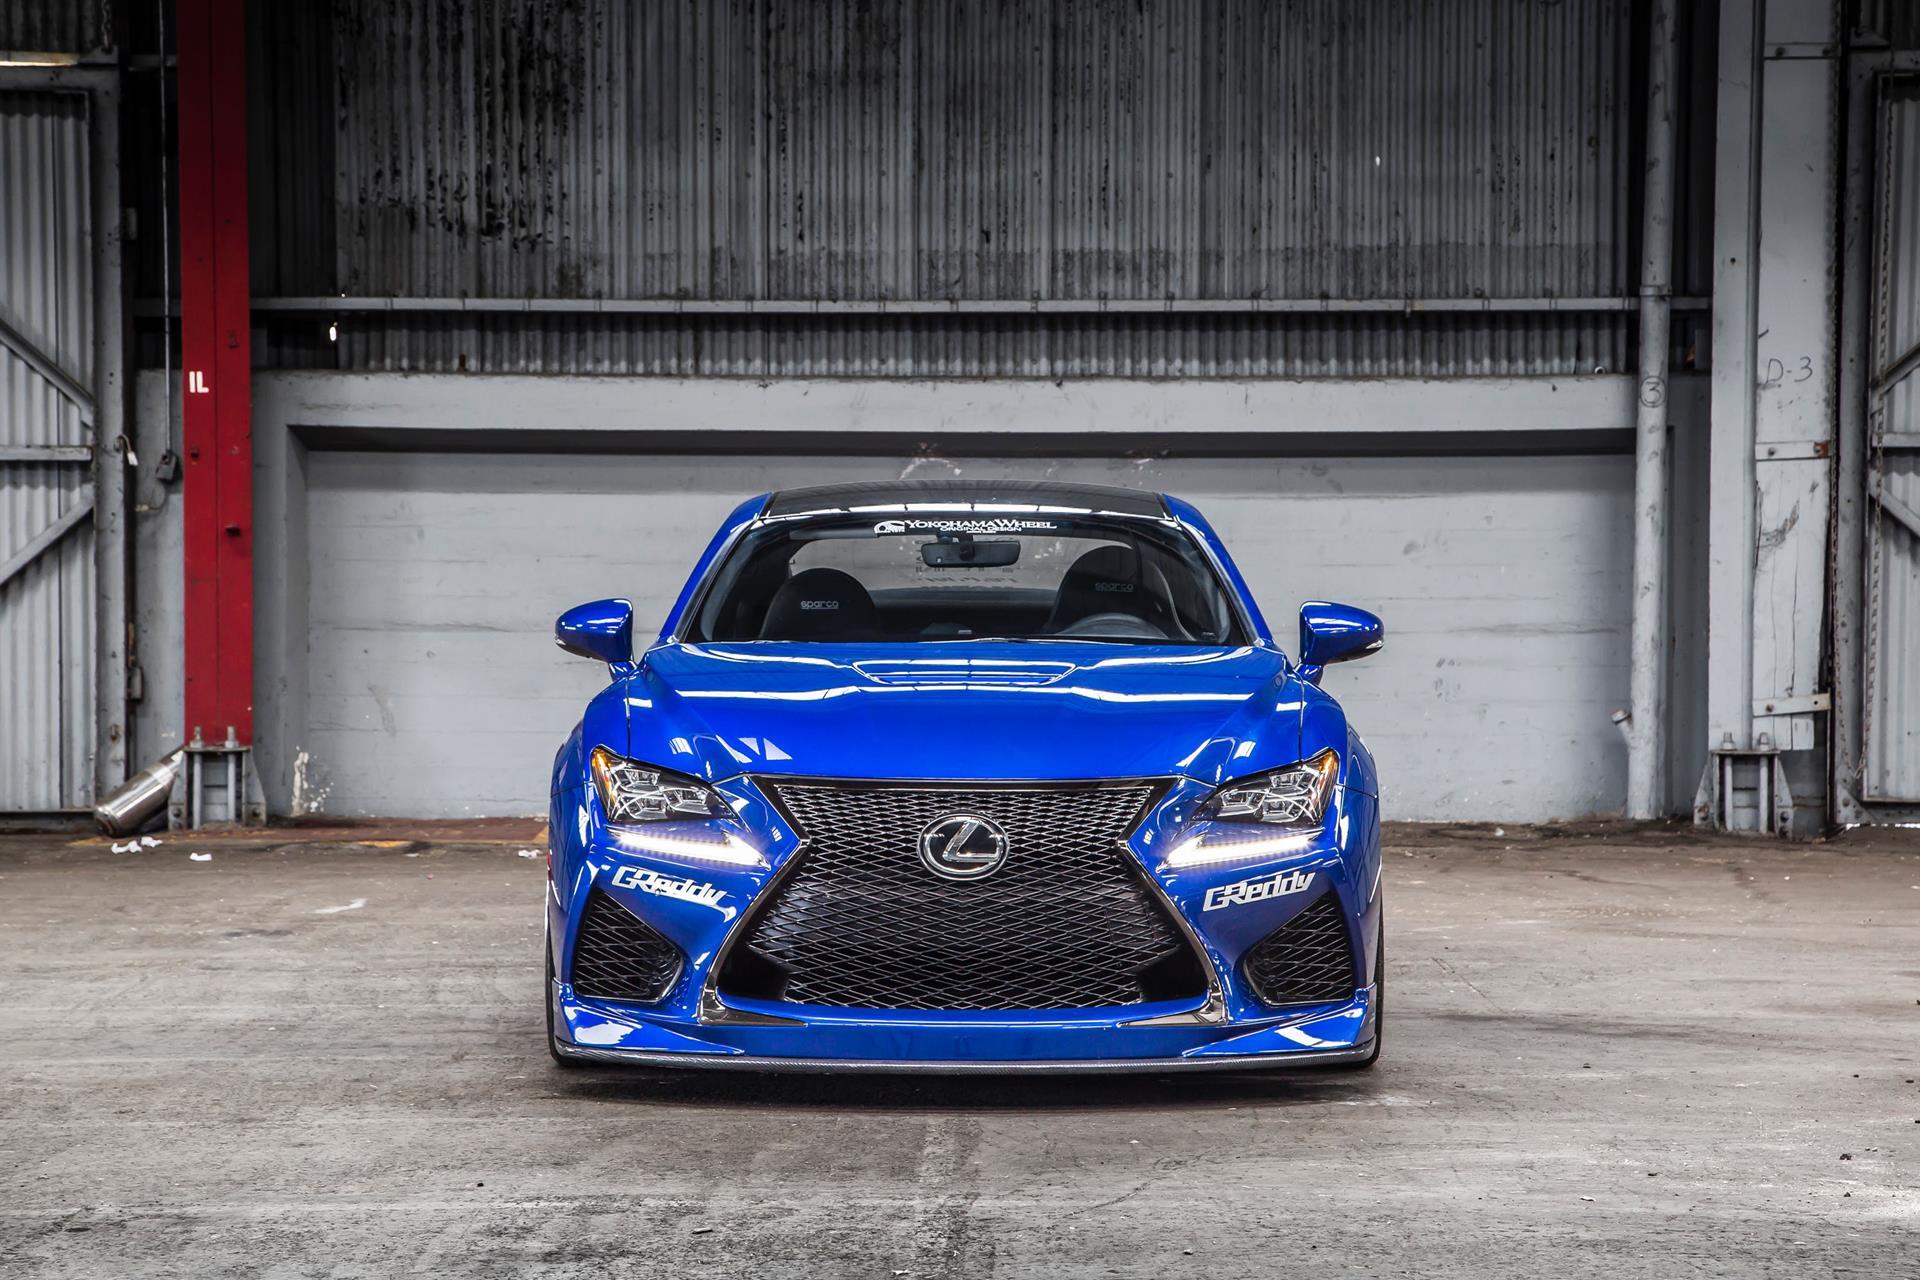 Gt86 Car Wallpaper 2015 Lexus Rc F Gordon Ting News And Information